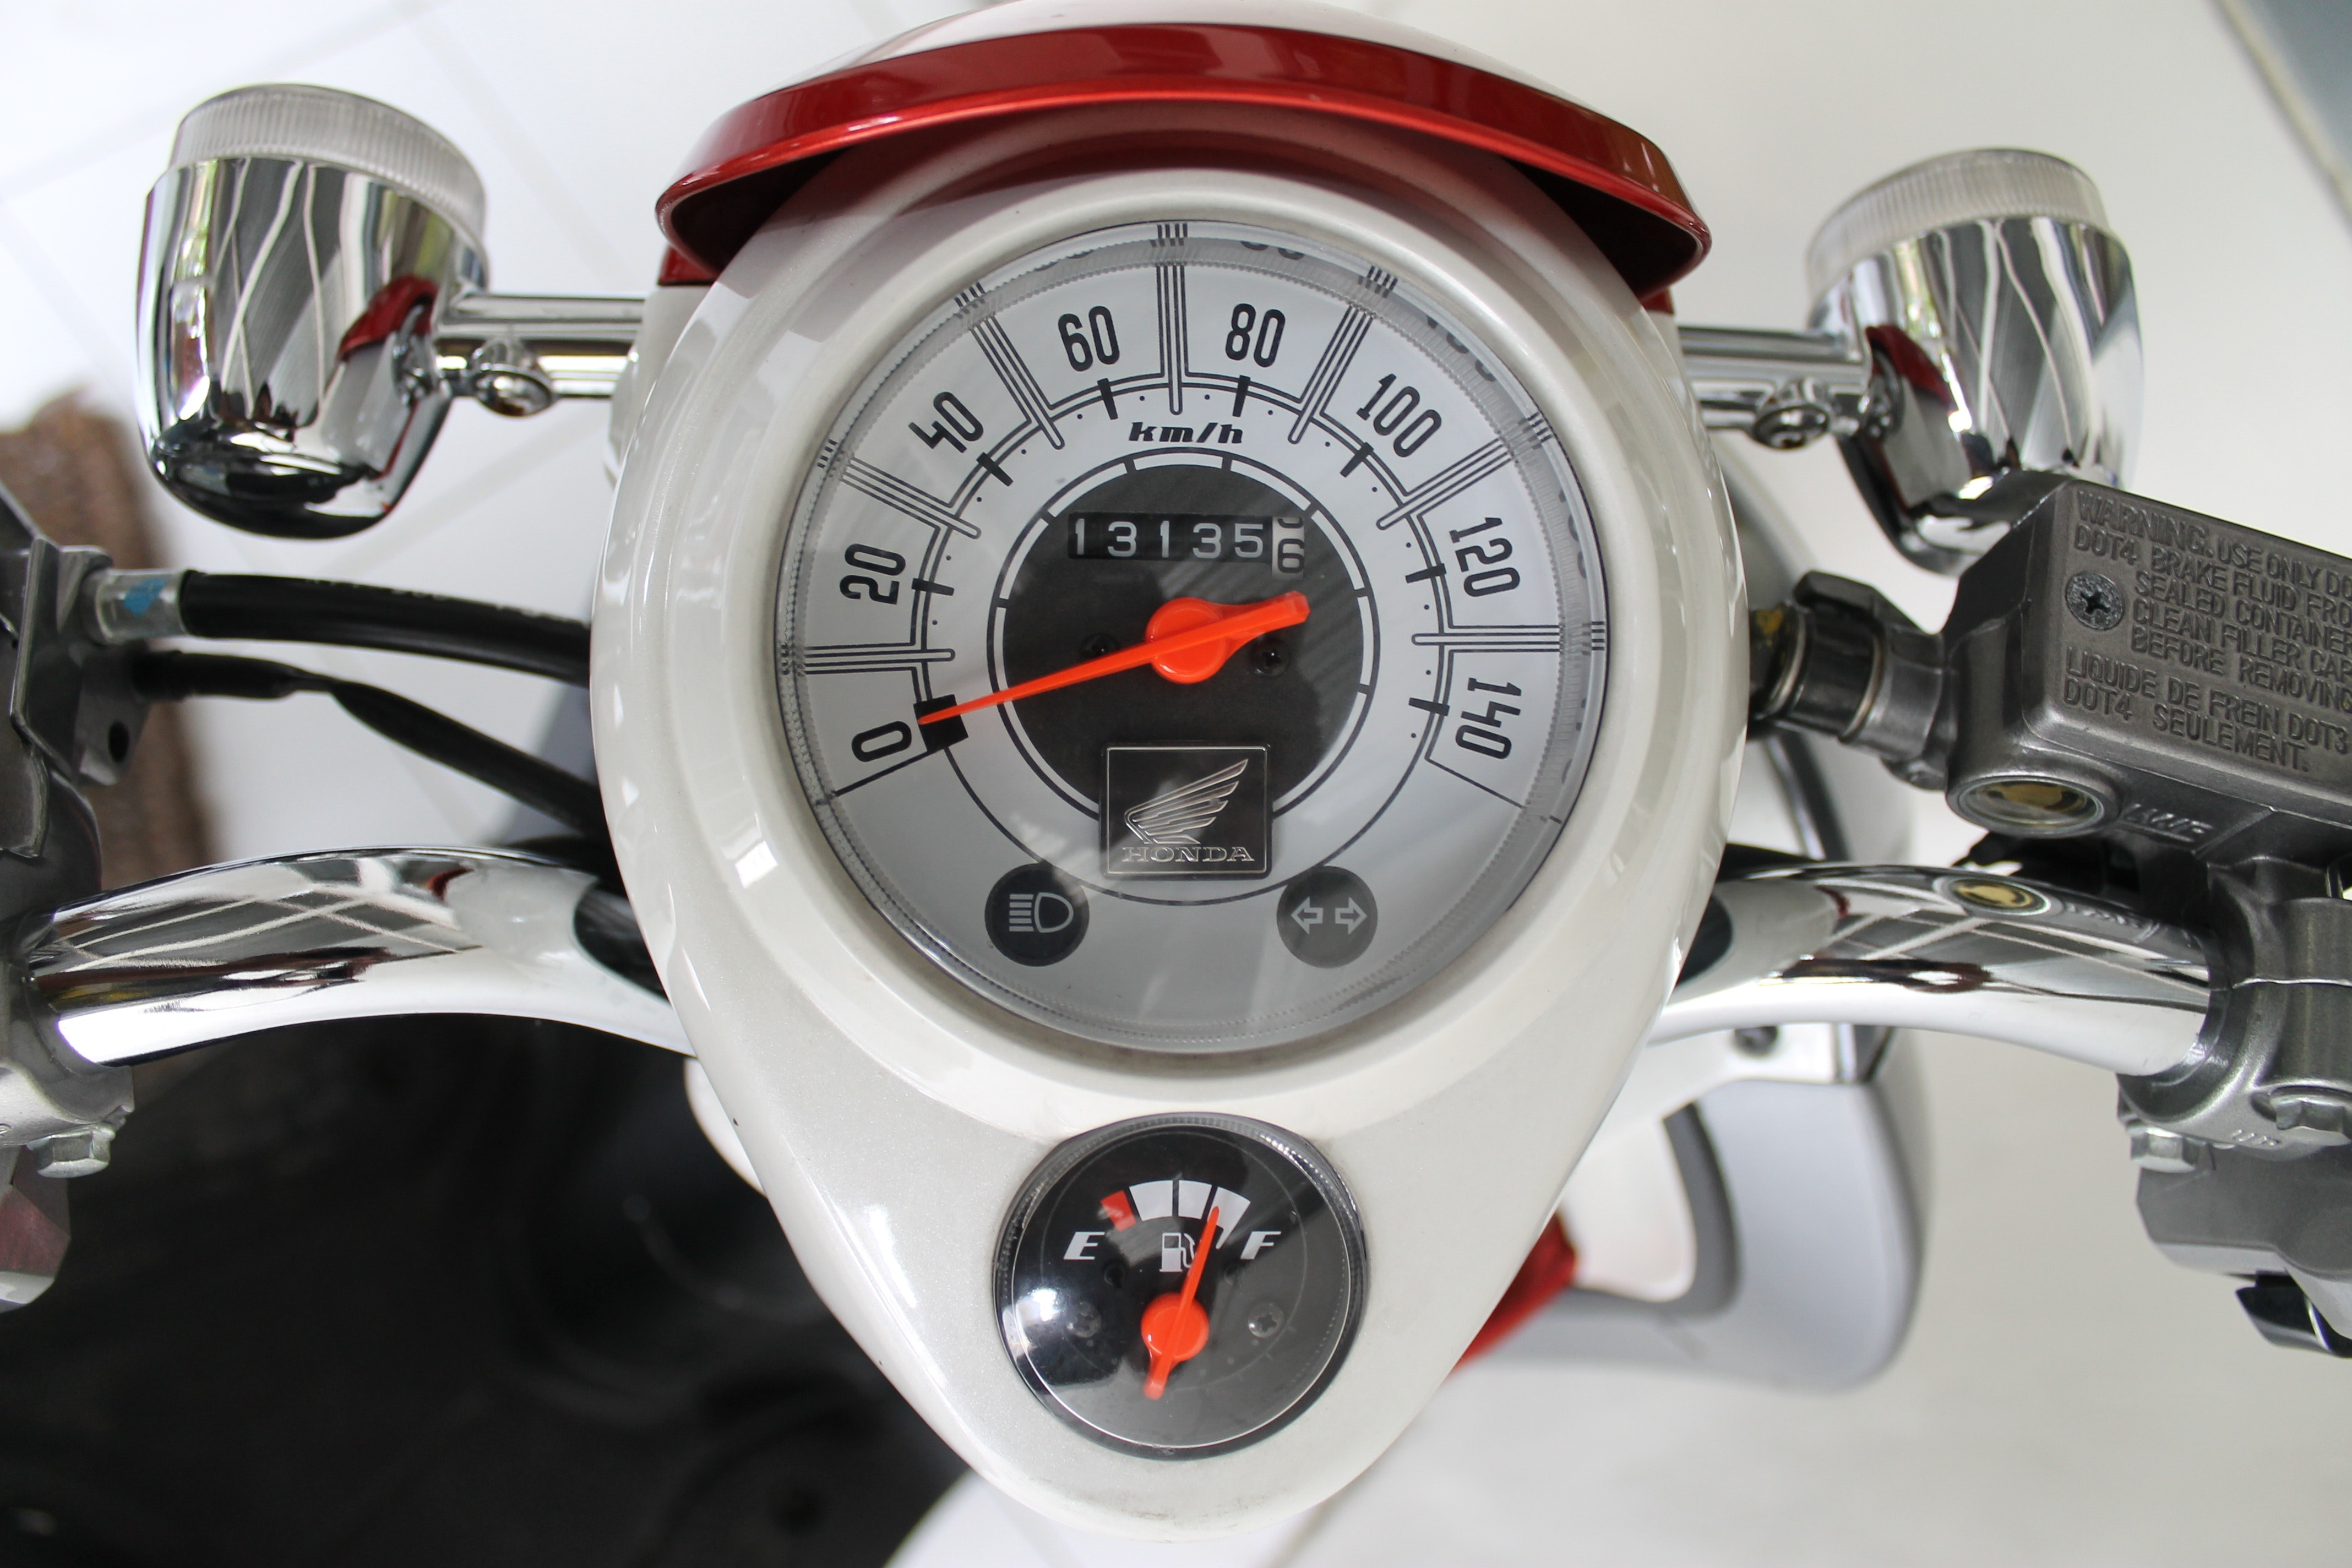 bike-chrome-fuel-indicator-47341